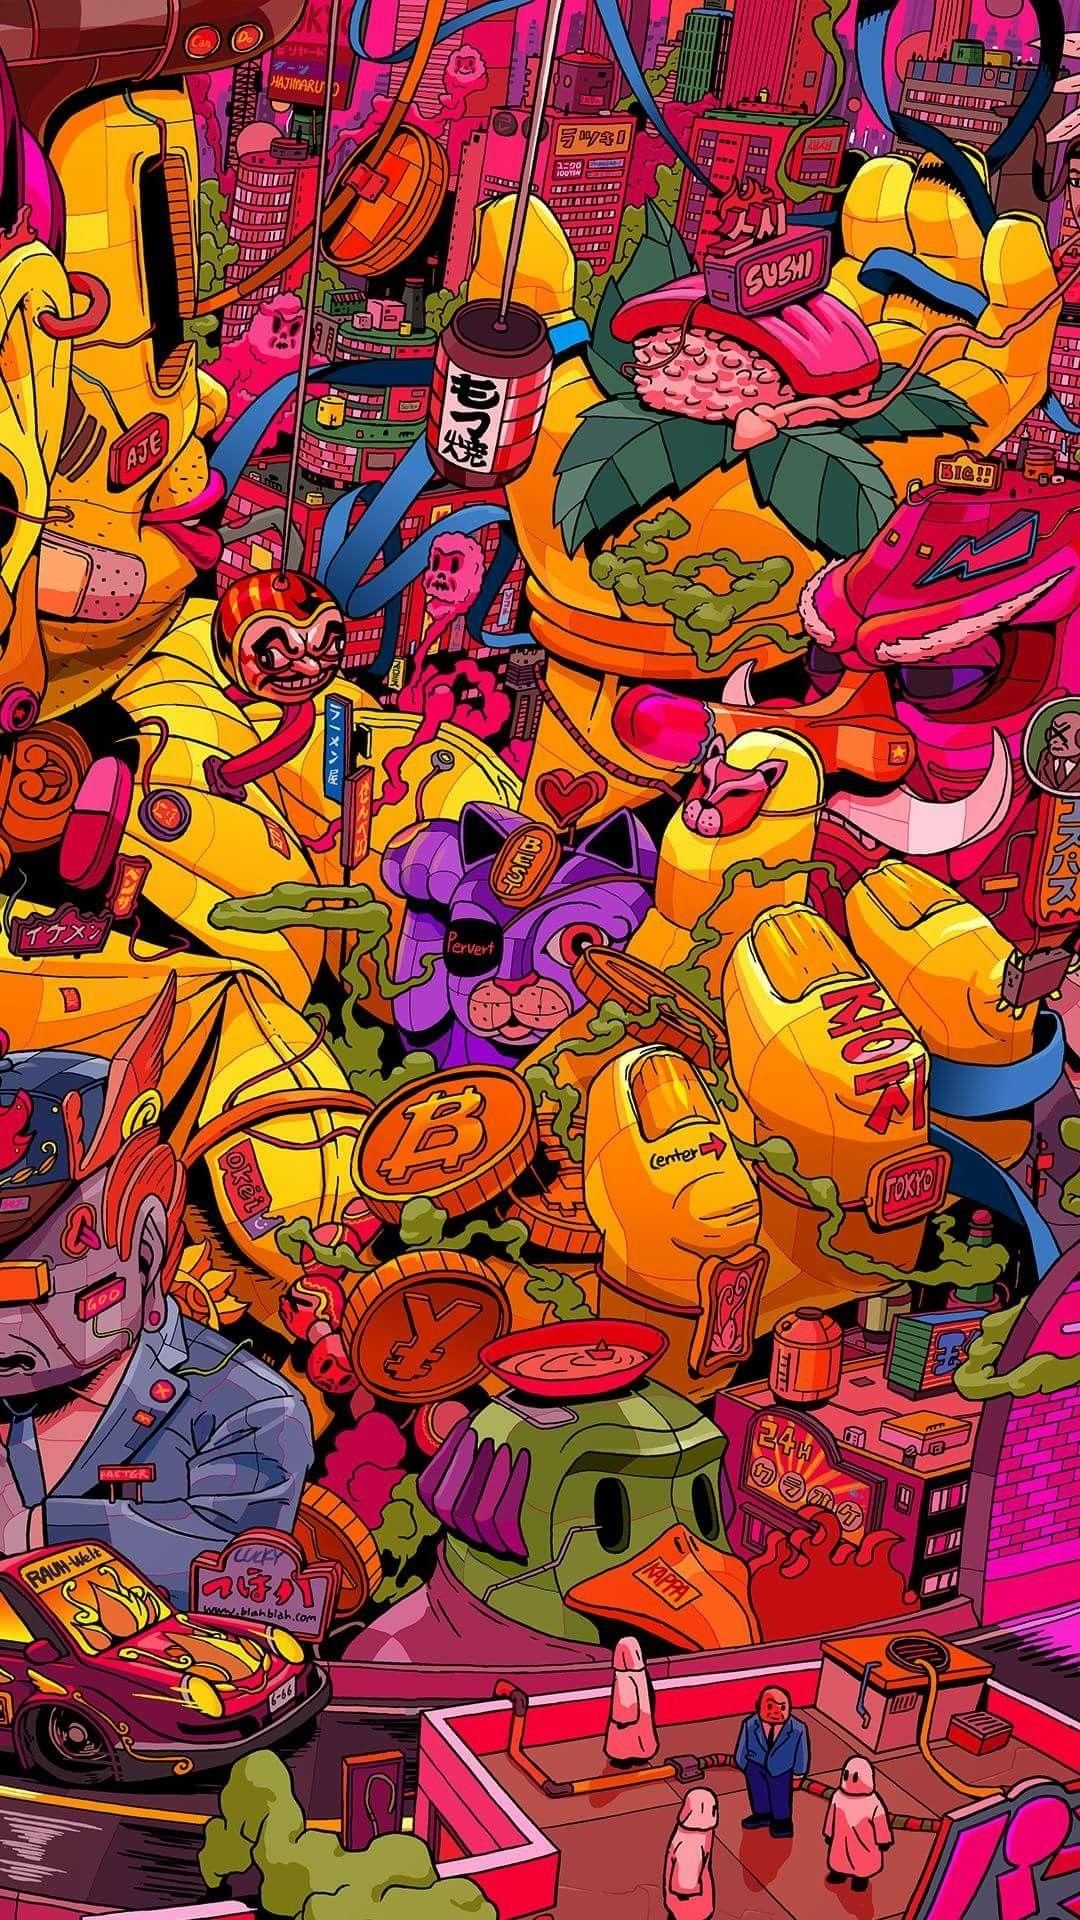 Mr Misang 3 4 Pop Art Wallpaper Art Wallpaper Graffiti Wallpaper